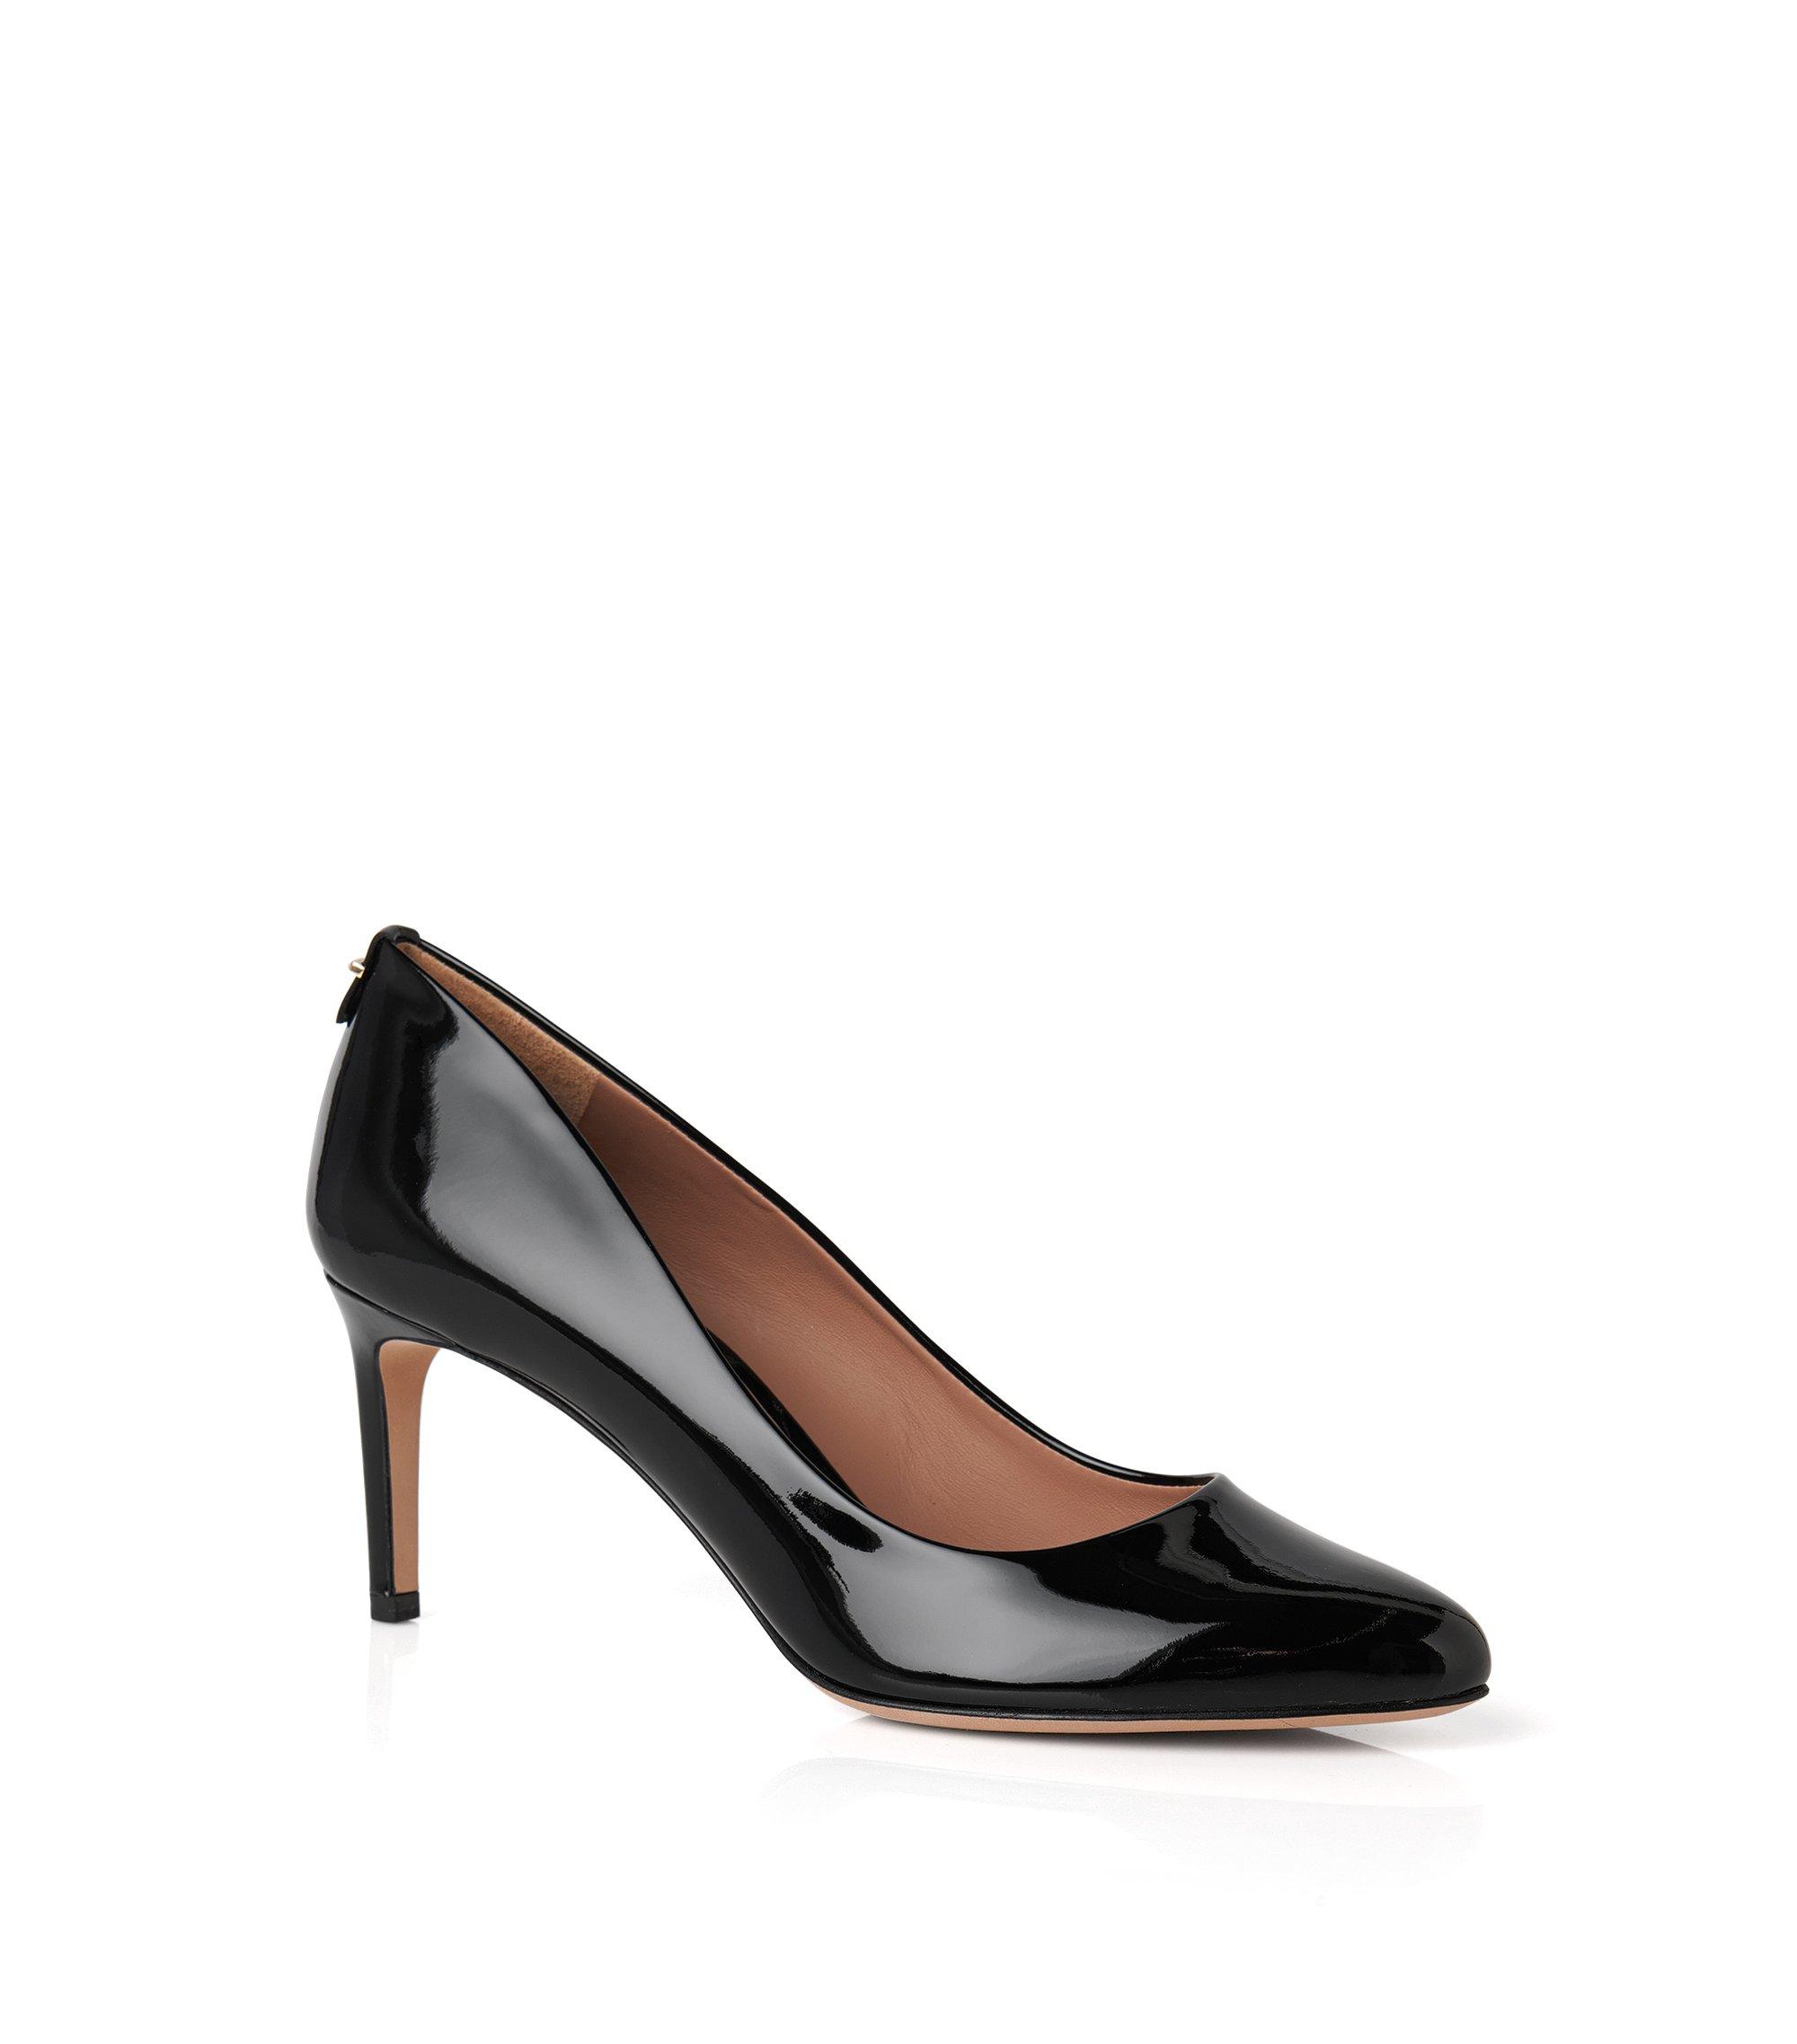 Escarpins BOSS Luxury Staple en cuir italien verni , Noir